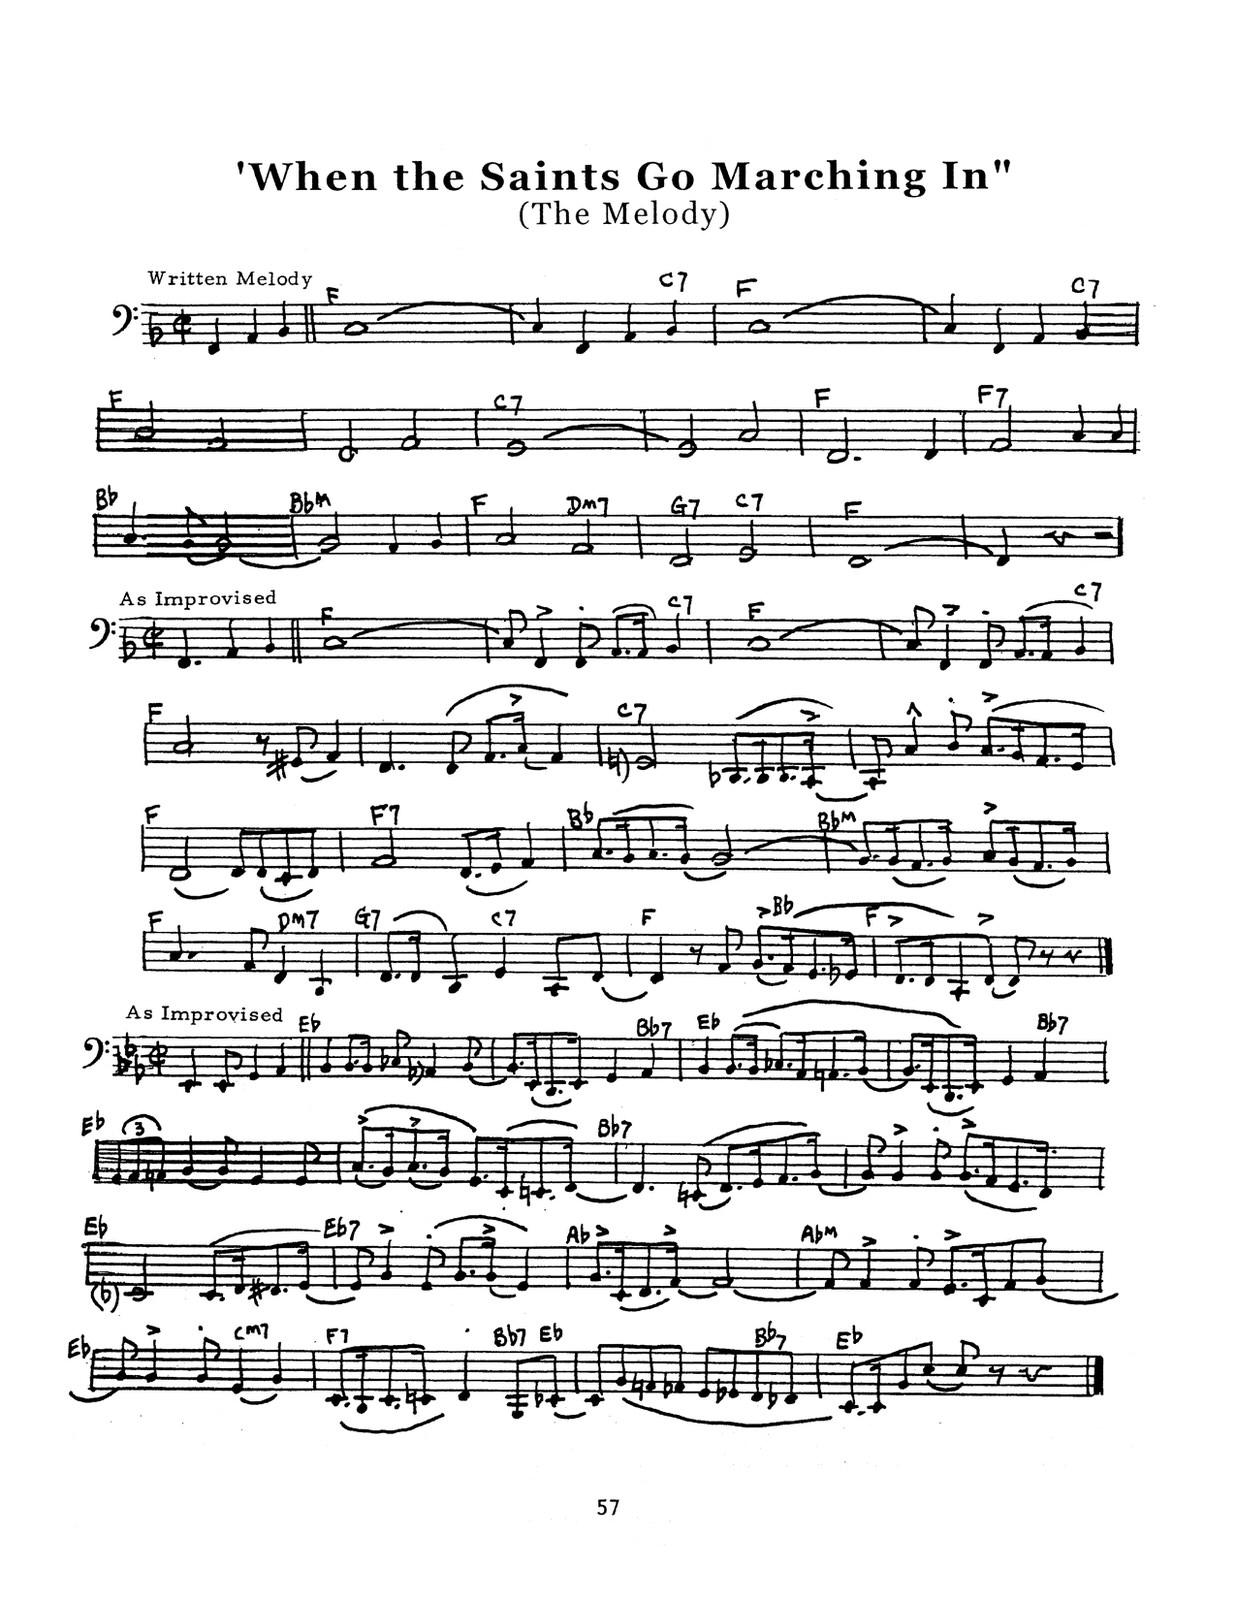 Tarto, Joe, Basic Rhythms and the Art of Improvisation-p059